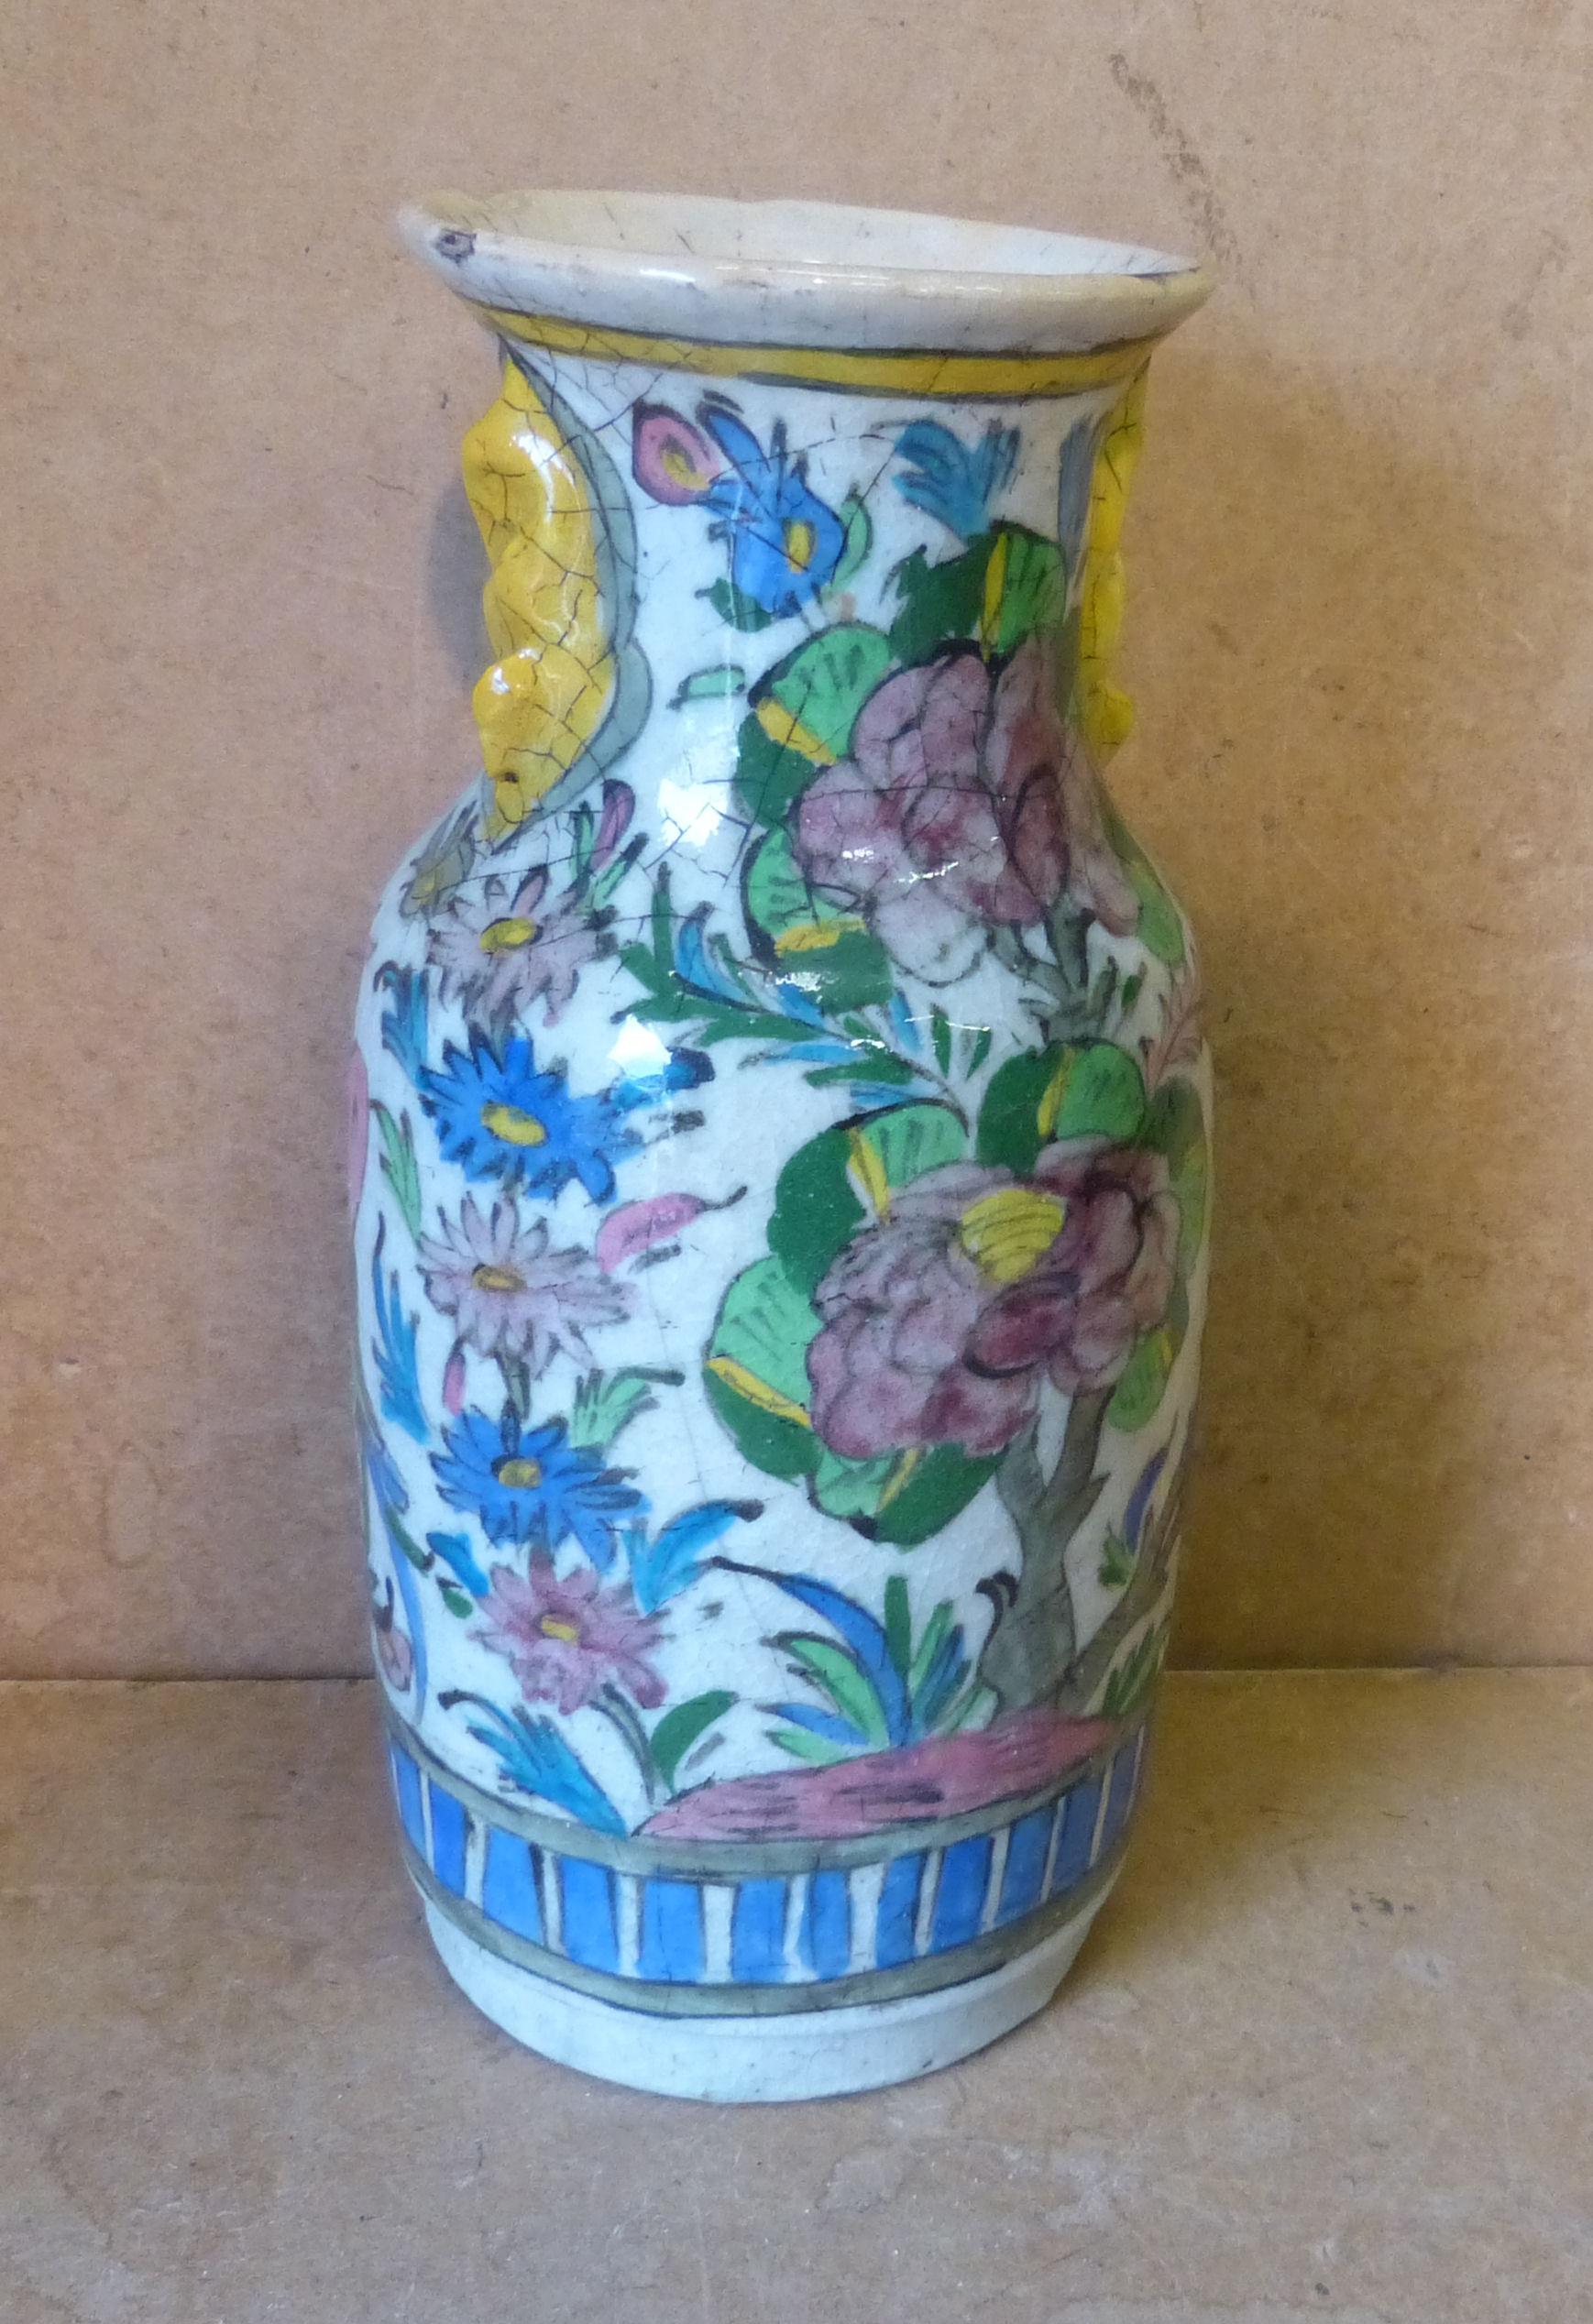 A Glazed Earthenware Bulbous Thin Neck Trumpet Shape Vase having multicoloured floral